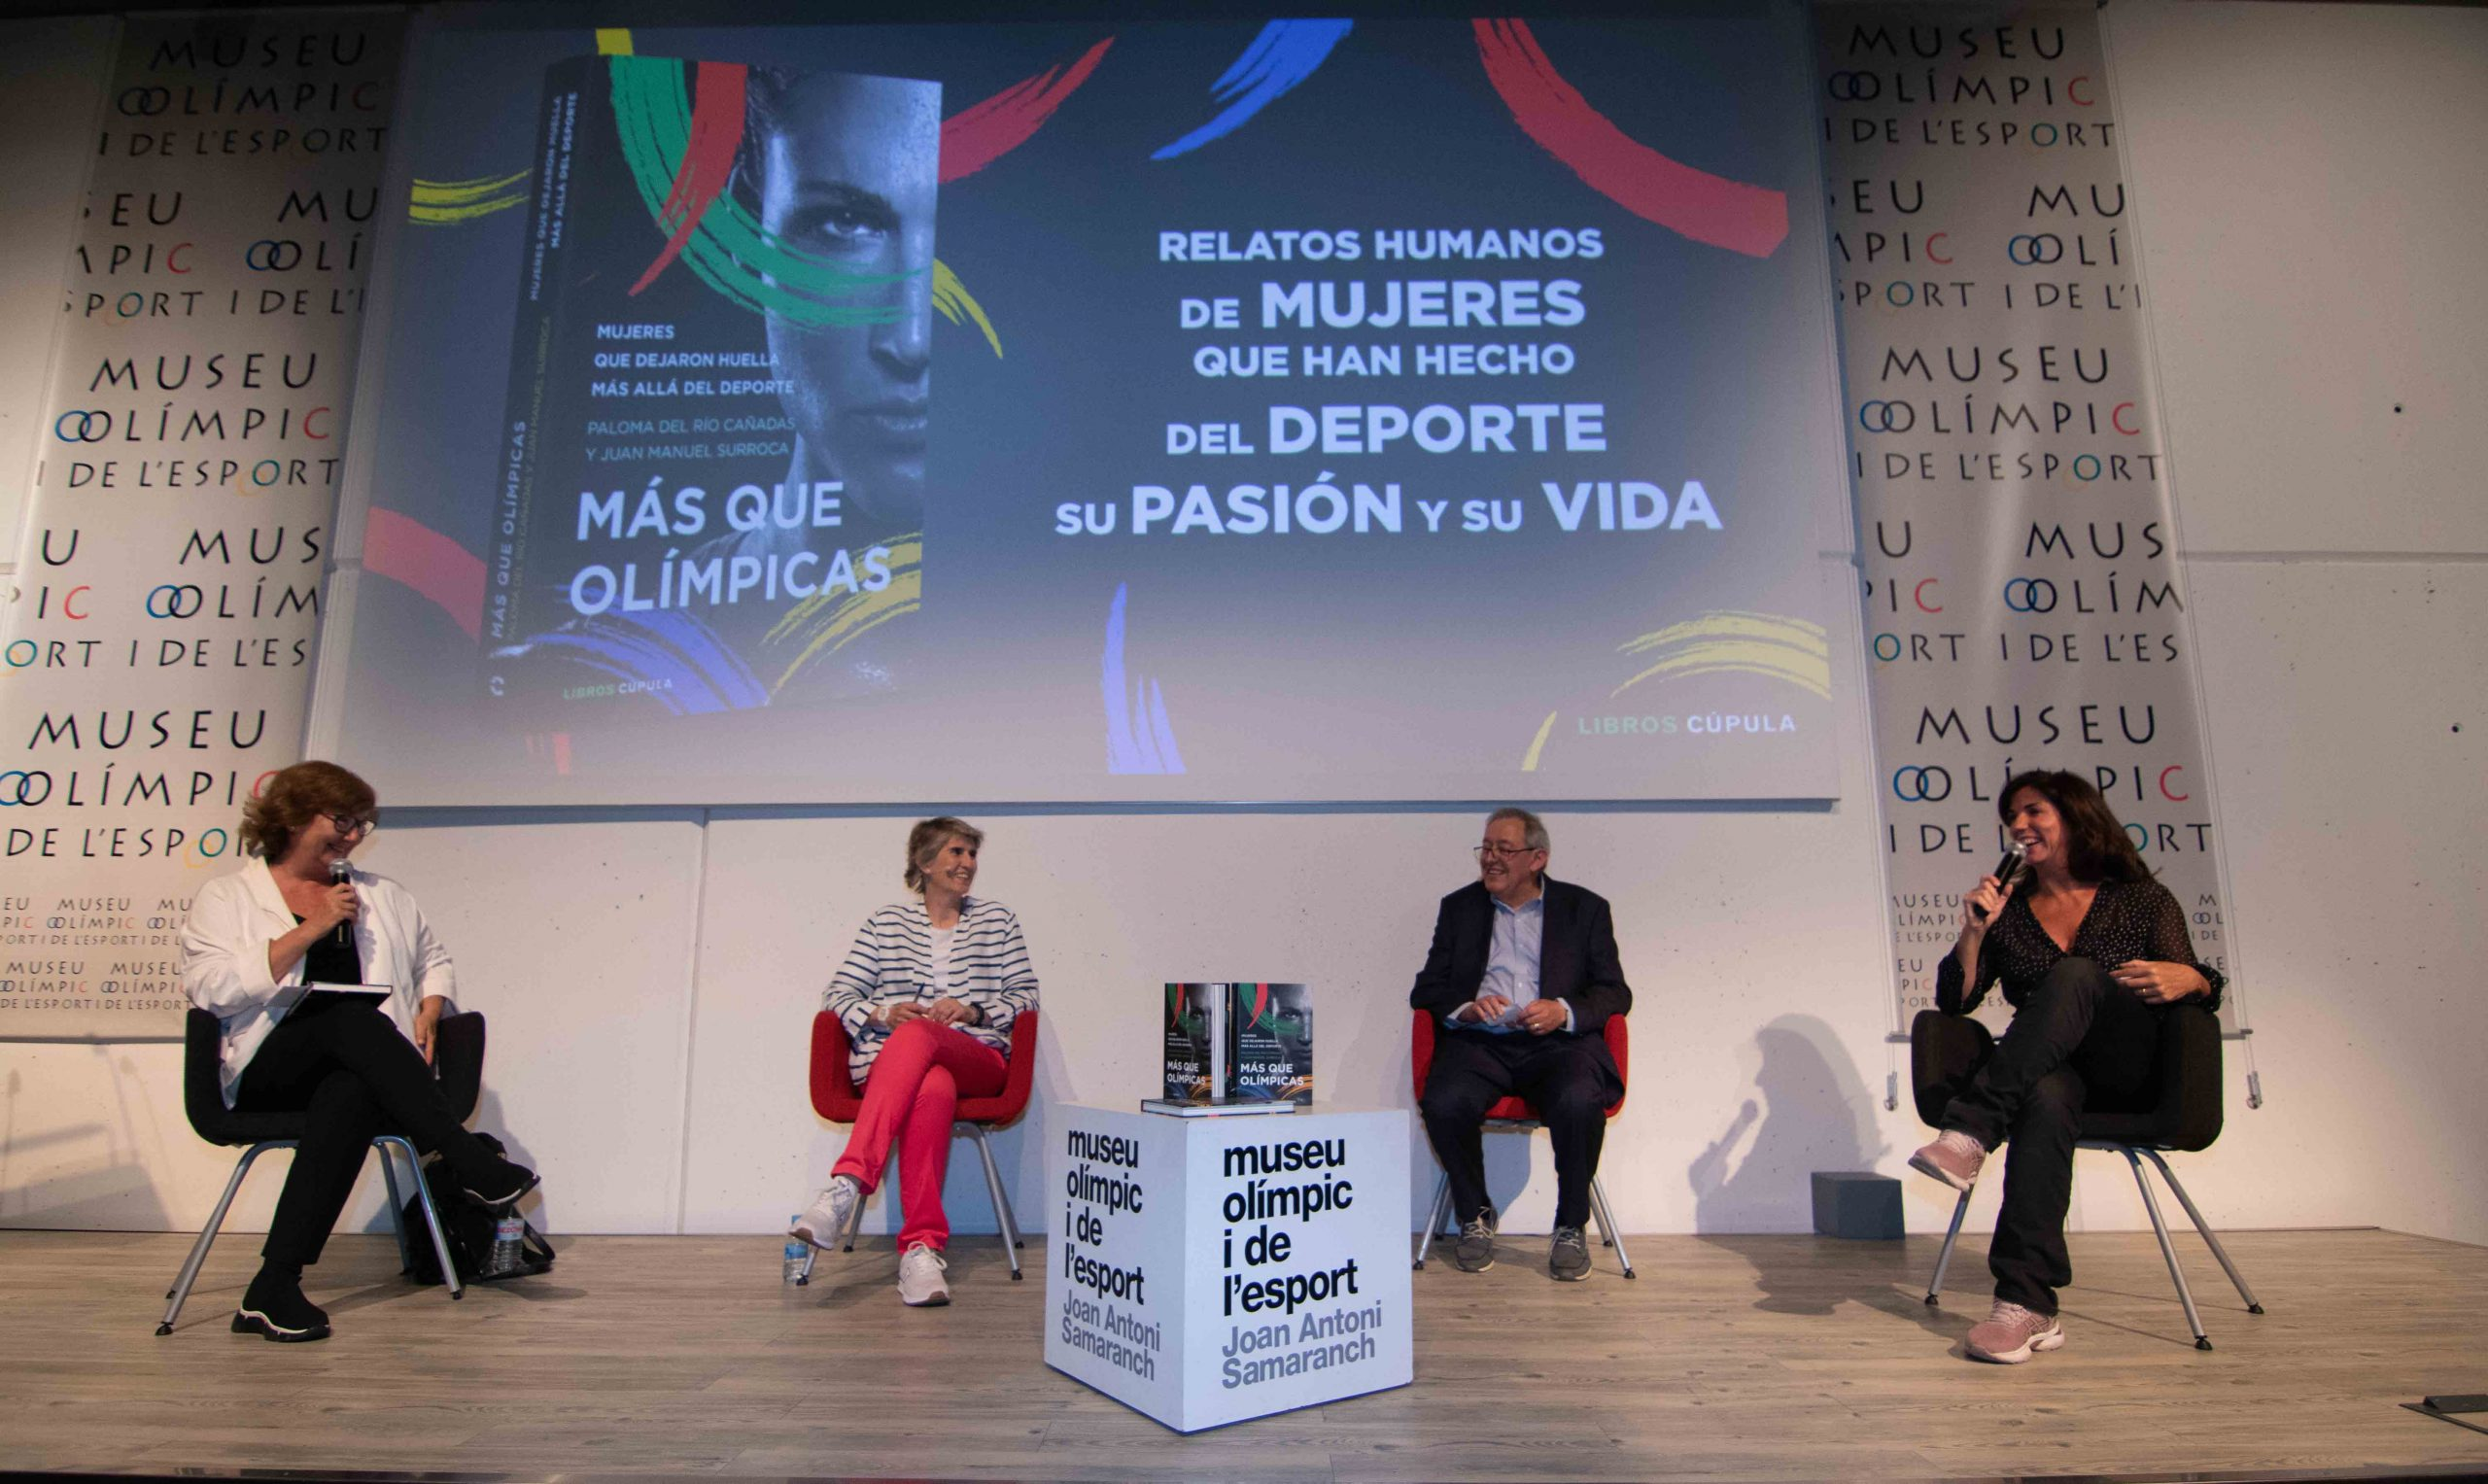 Mas_Que_olimpicas_Viza_paloma_del_rio_surro_Cubero_museu_olimpic